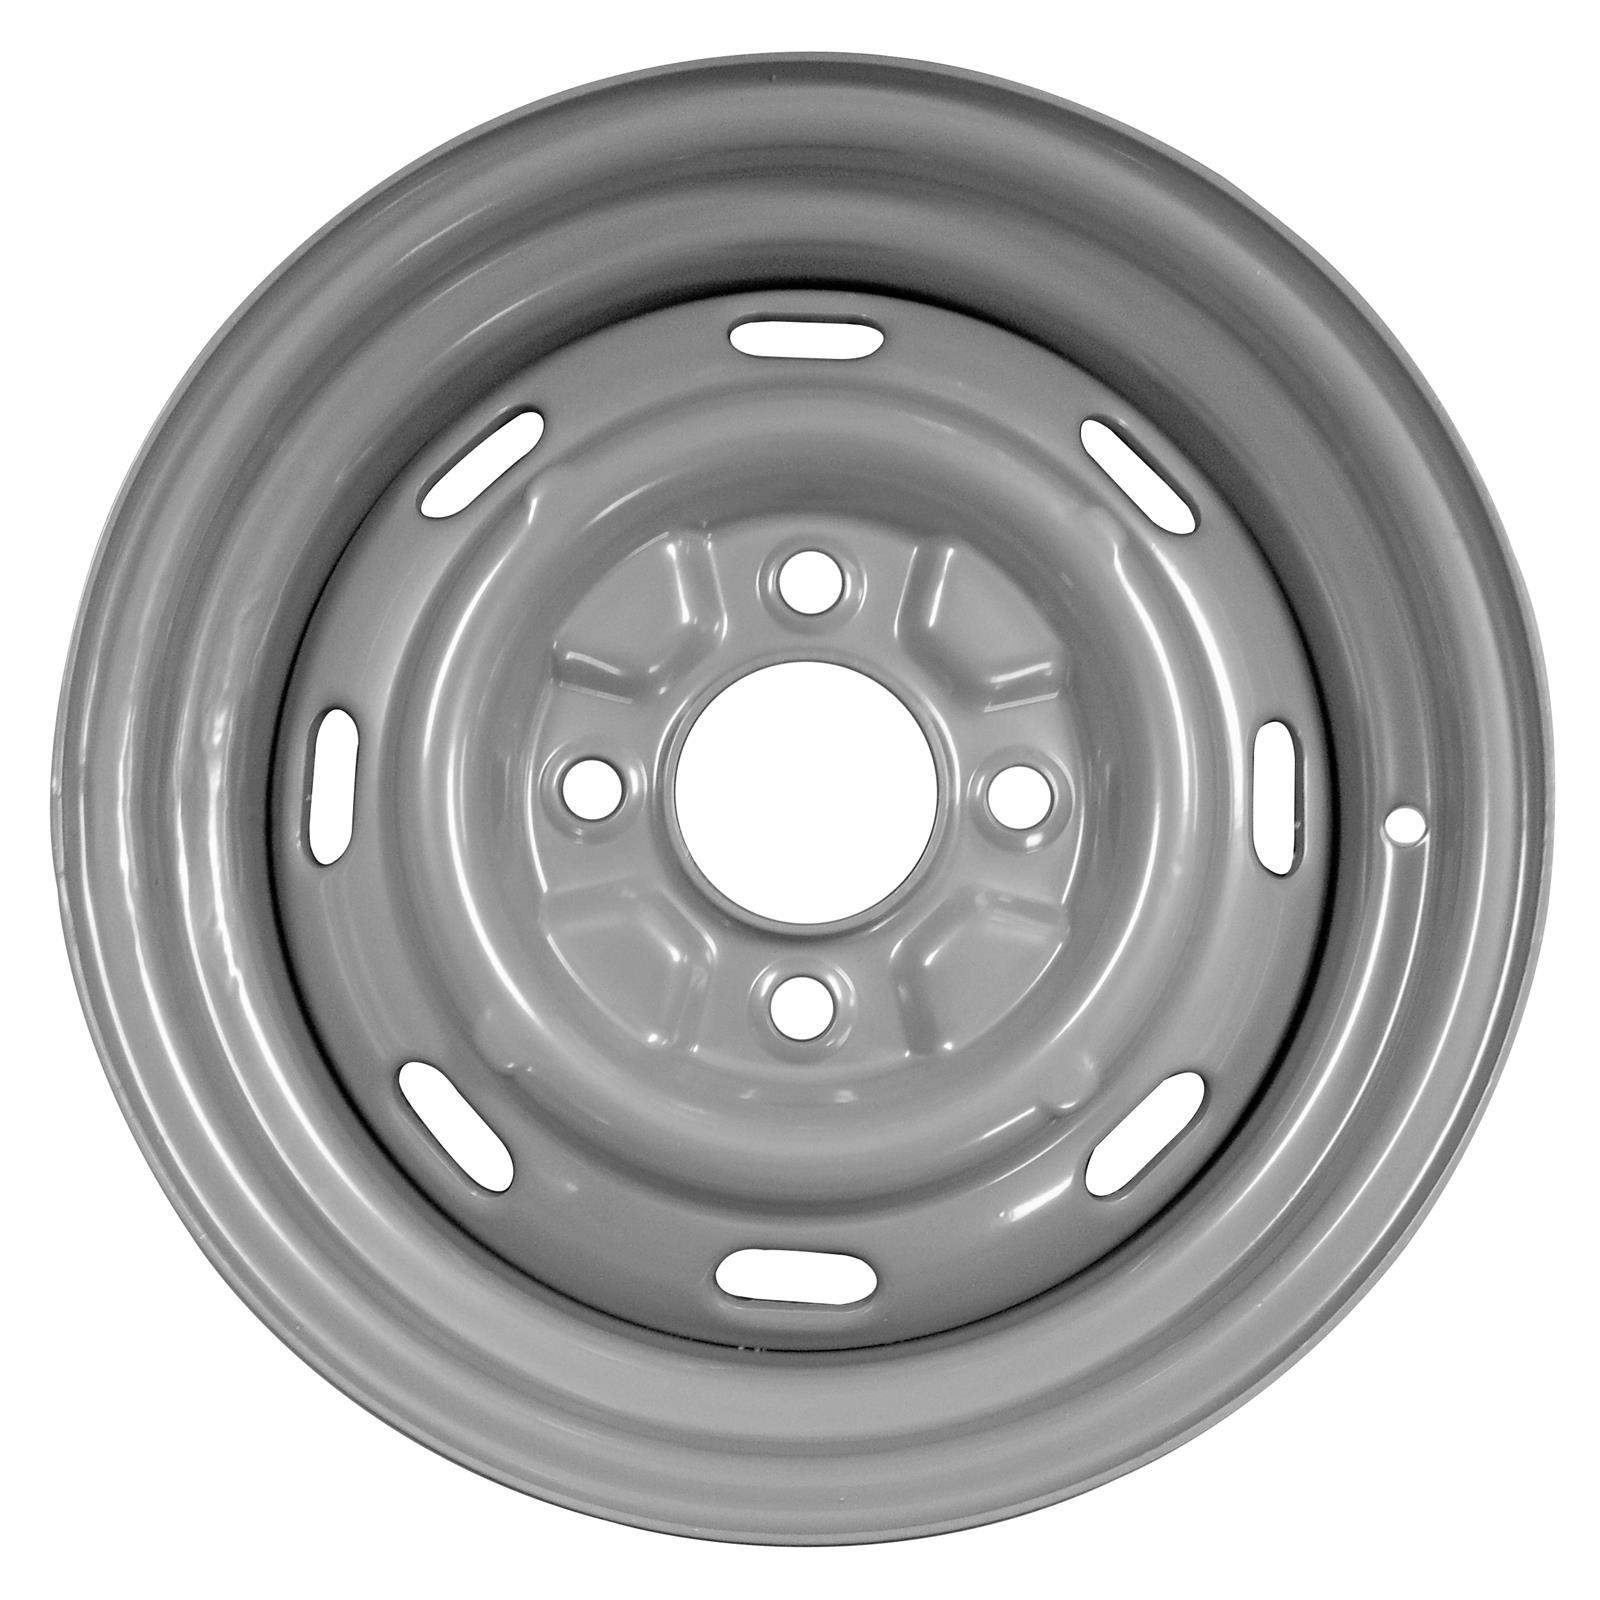 Vw Bug Air Cooled Wheels: US Wheel 131 VW BEETLE/GHIA 15x4.5 4x130mm Steel Silver Ea